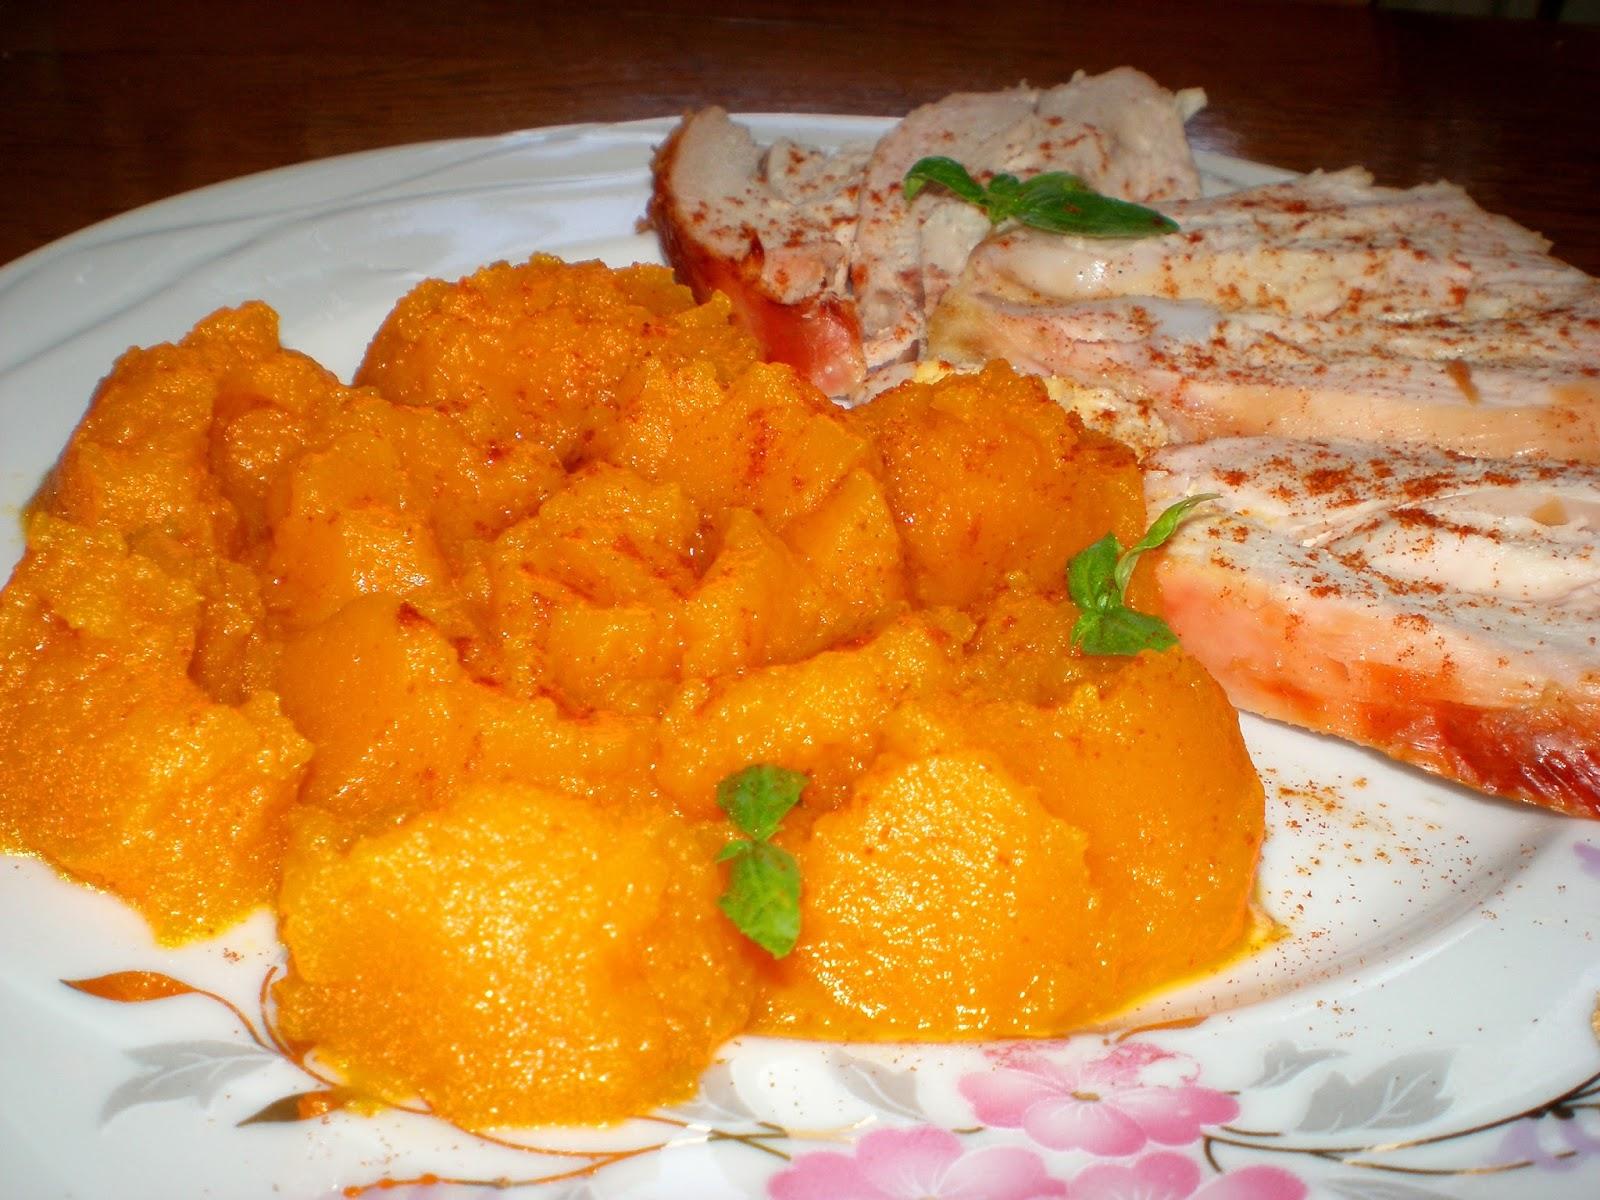 Piure de morcovi